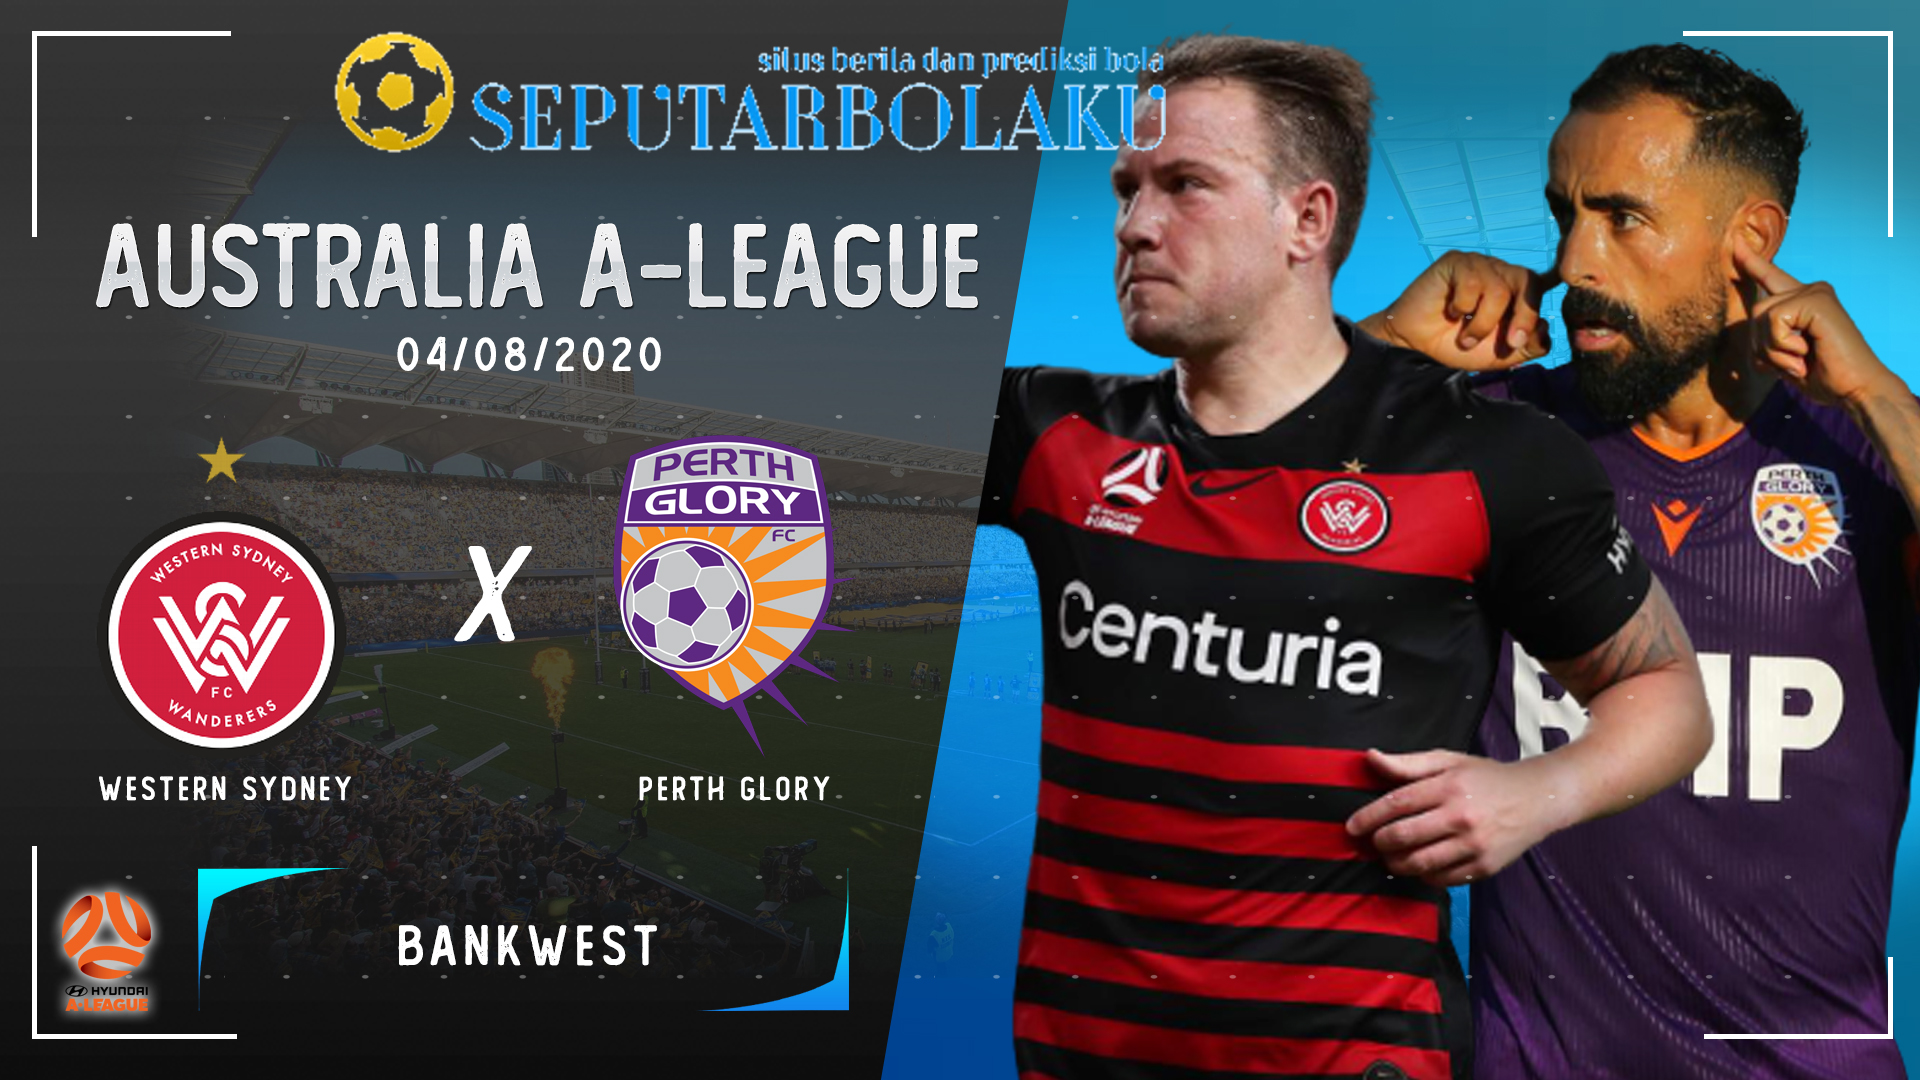 Prediksi Bola Western Sydney vs Perth Glory 4 Agustus 2020